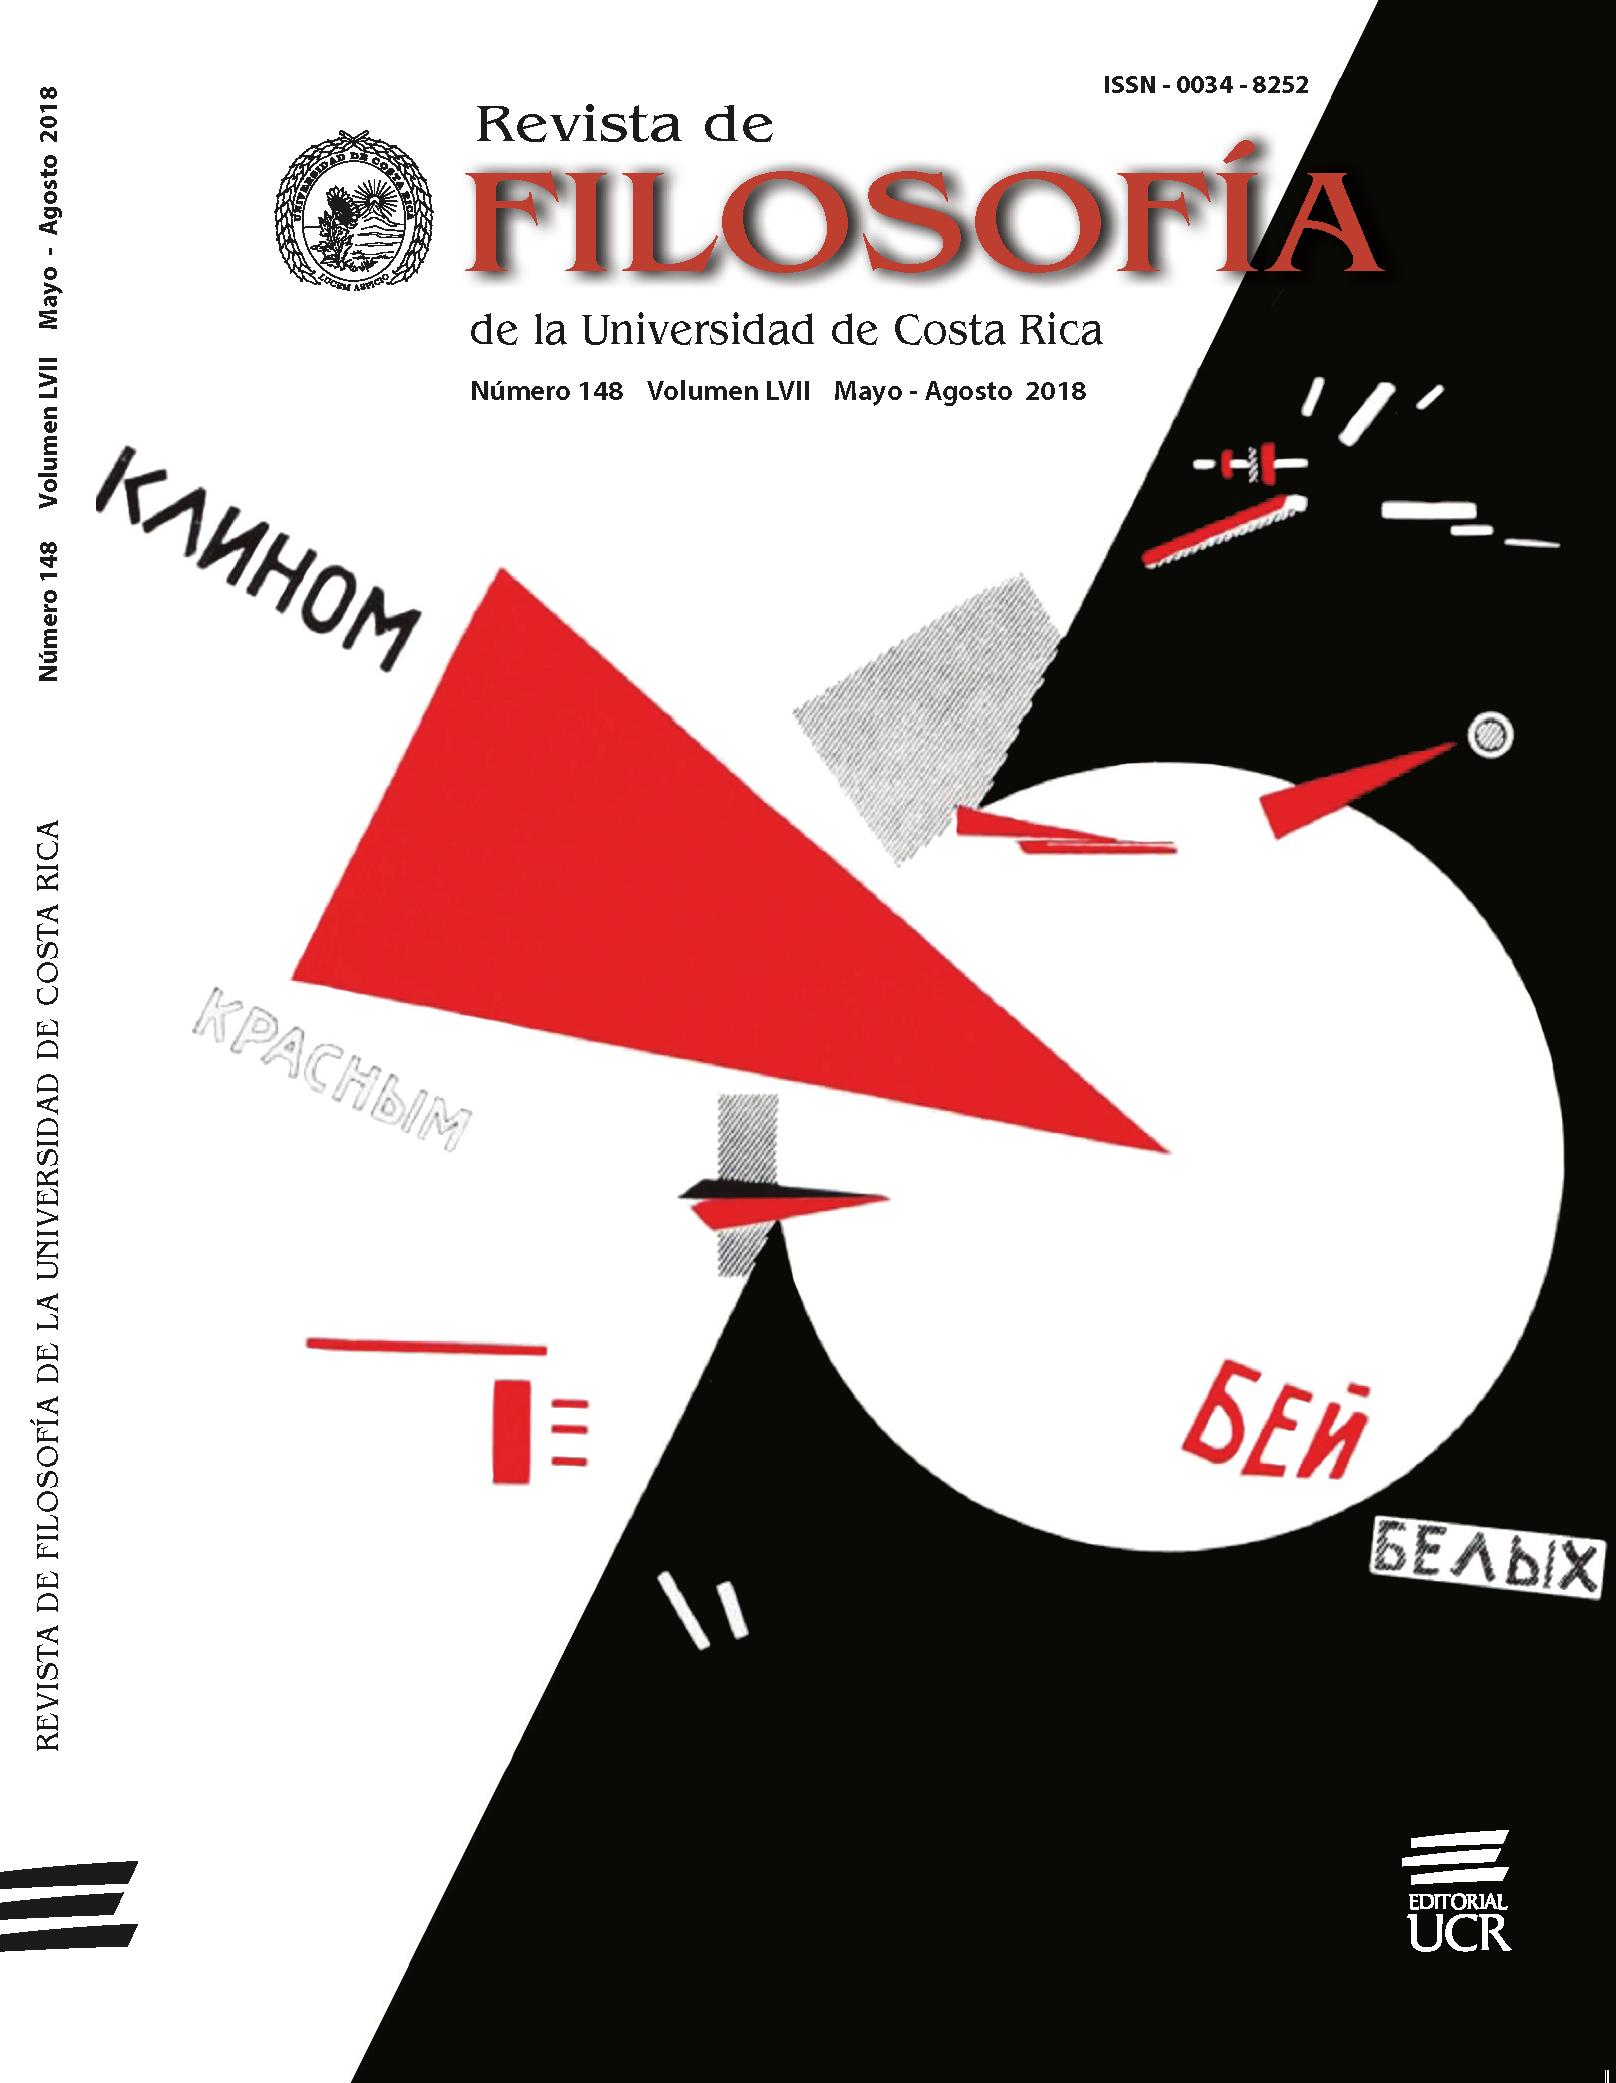 Portada Revista de Filosofía UCR  Vol LVIII No 148